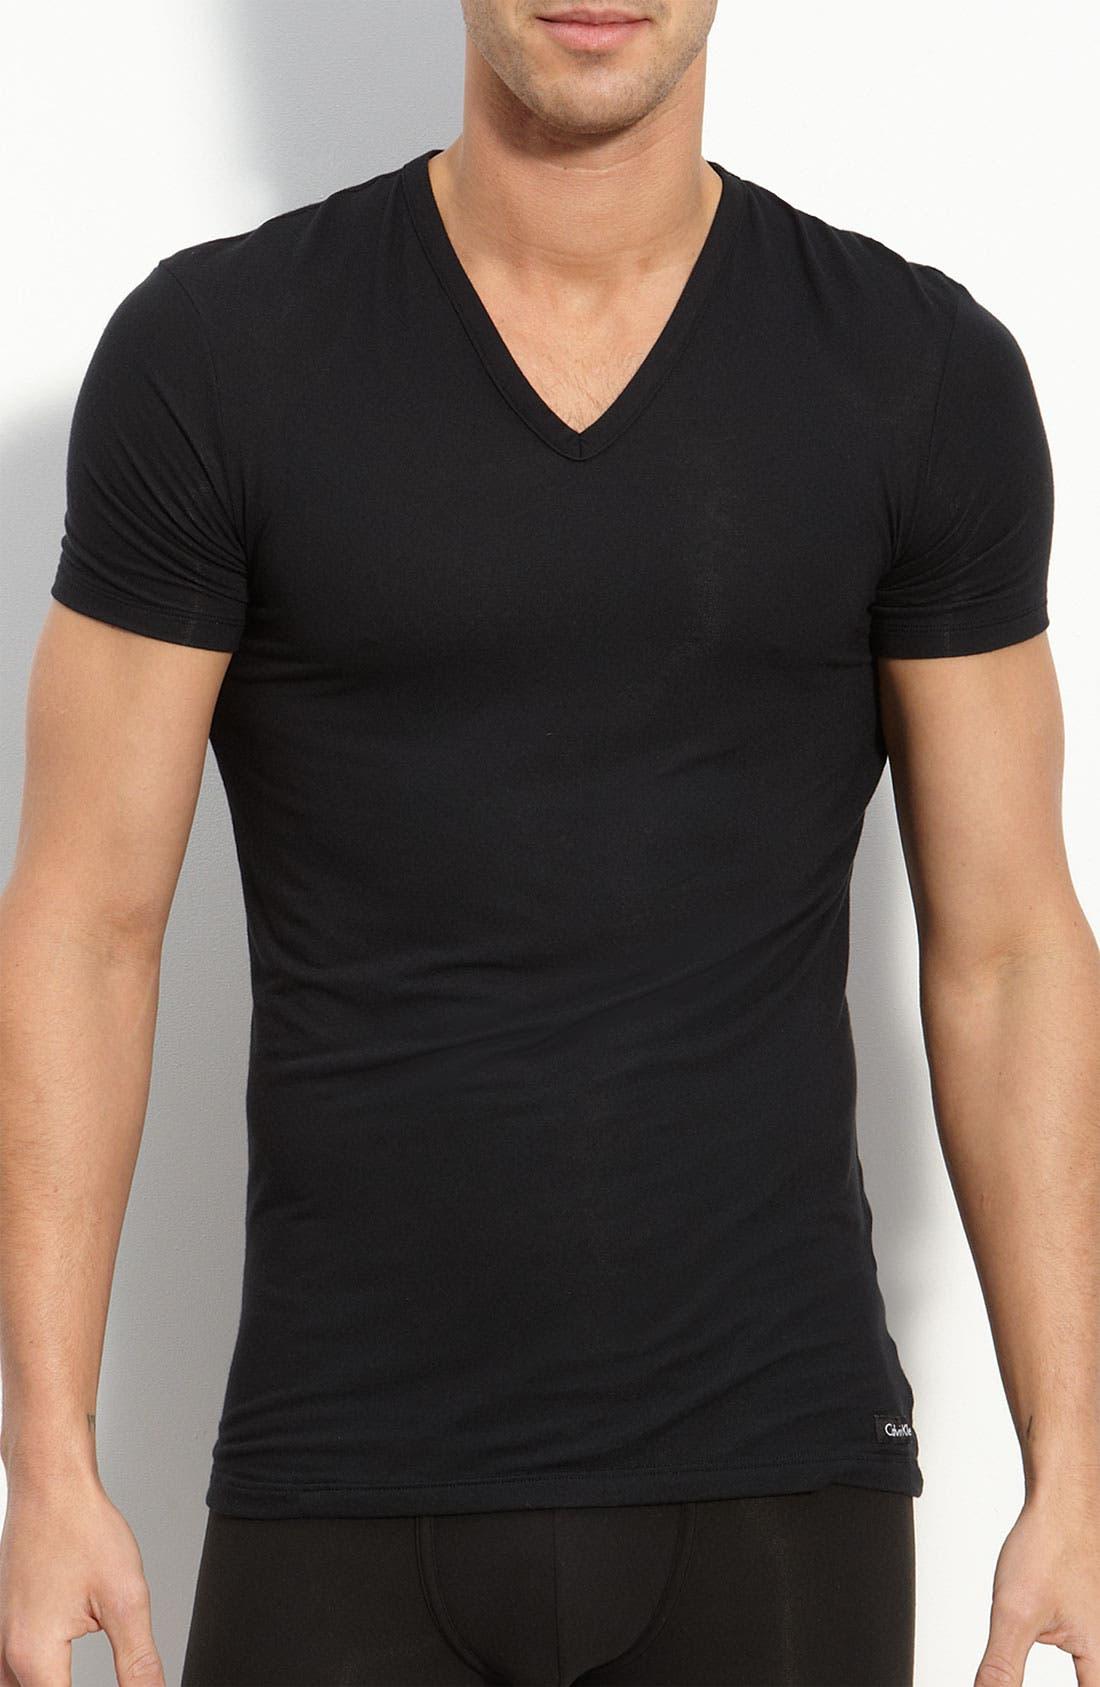 'U5563' V-Neck Micromodal T-Shirt, Main, color, BLACK